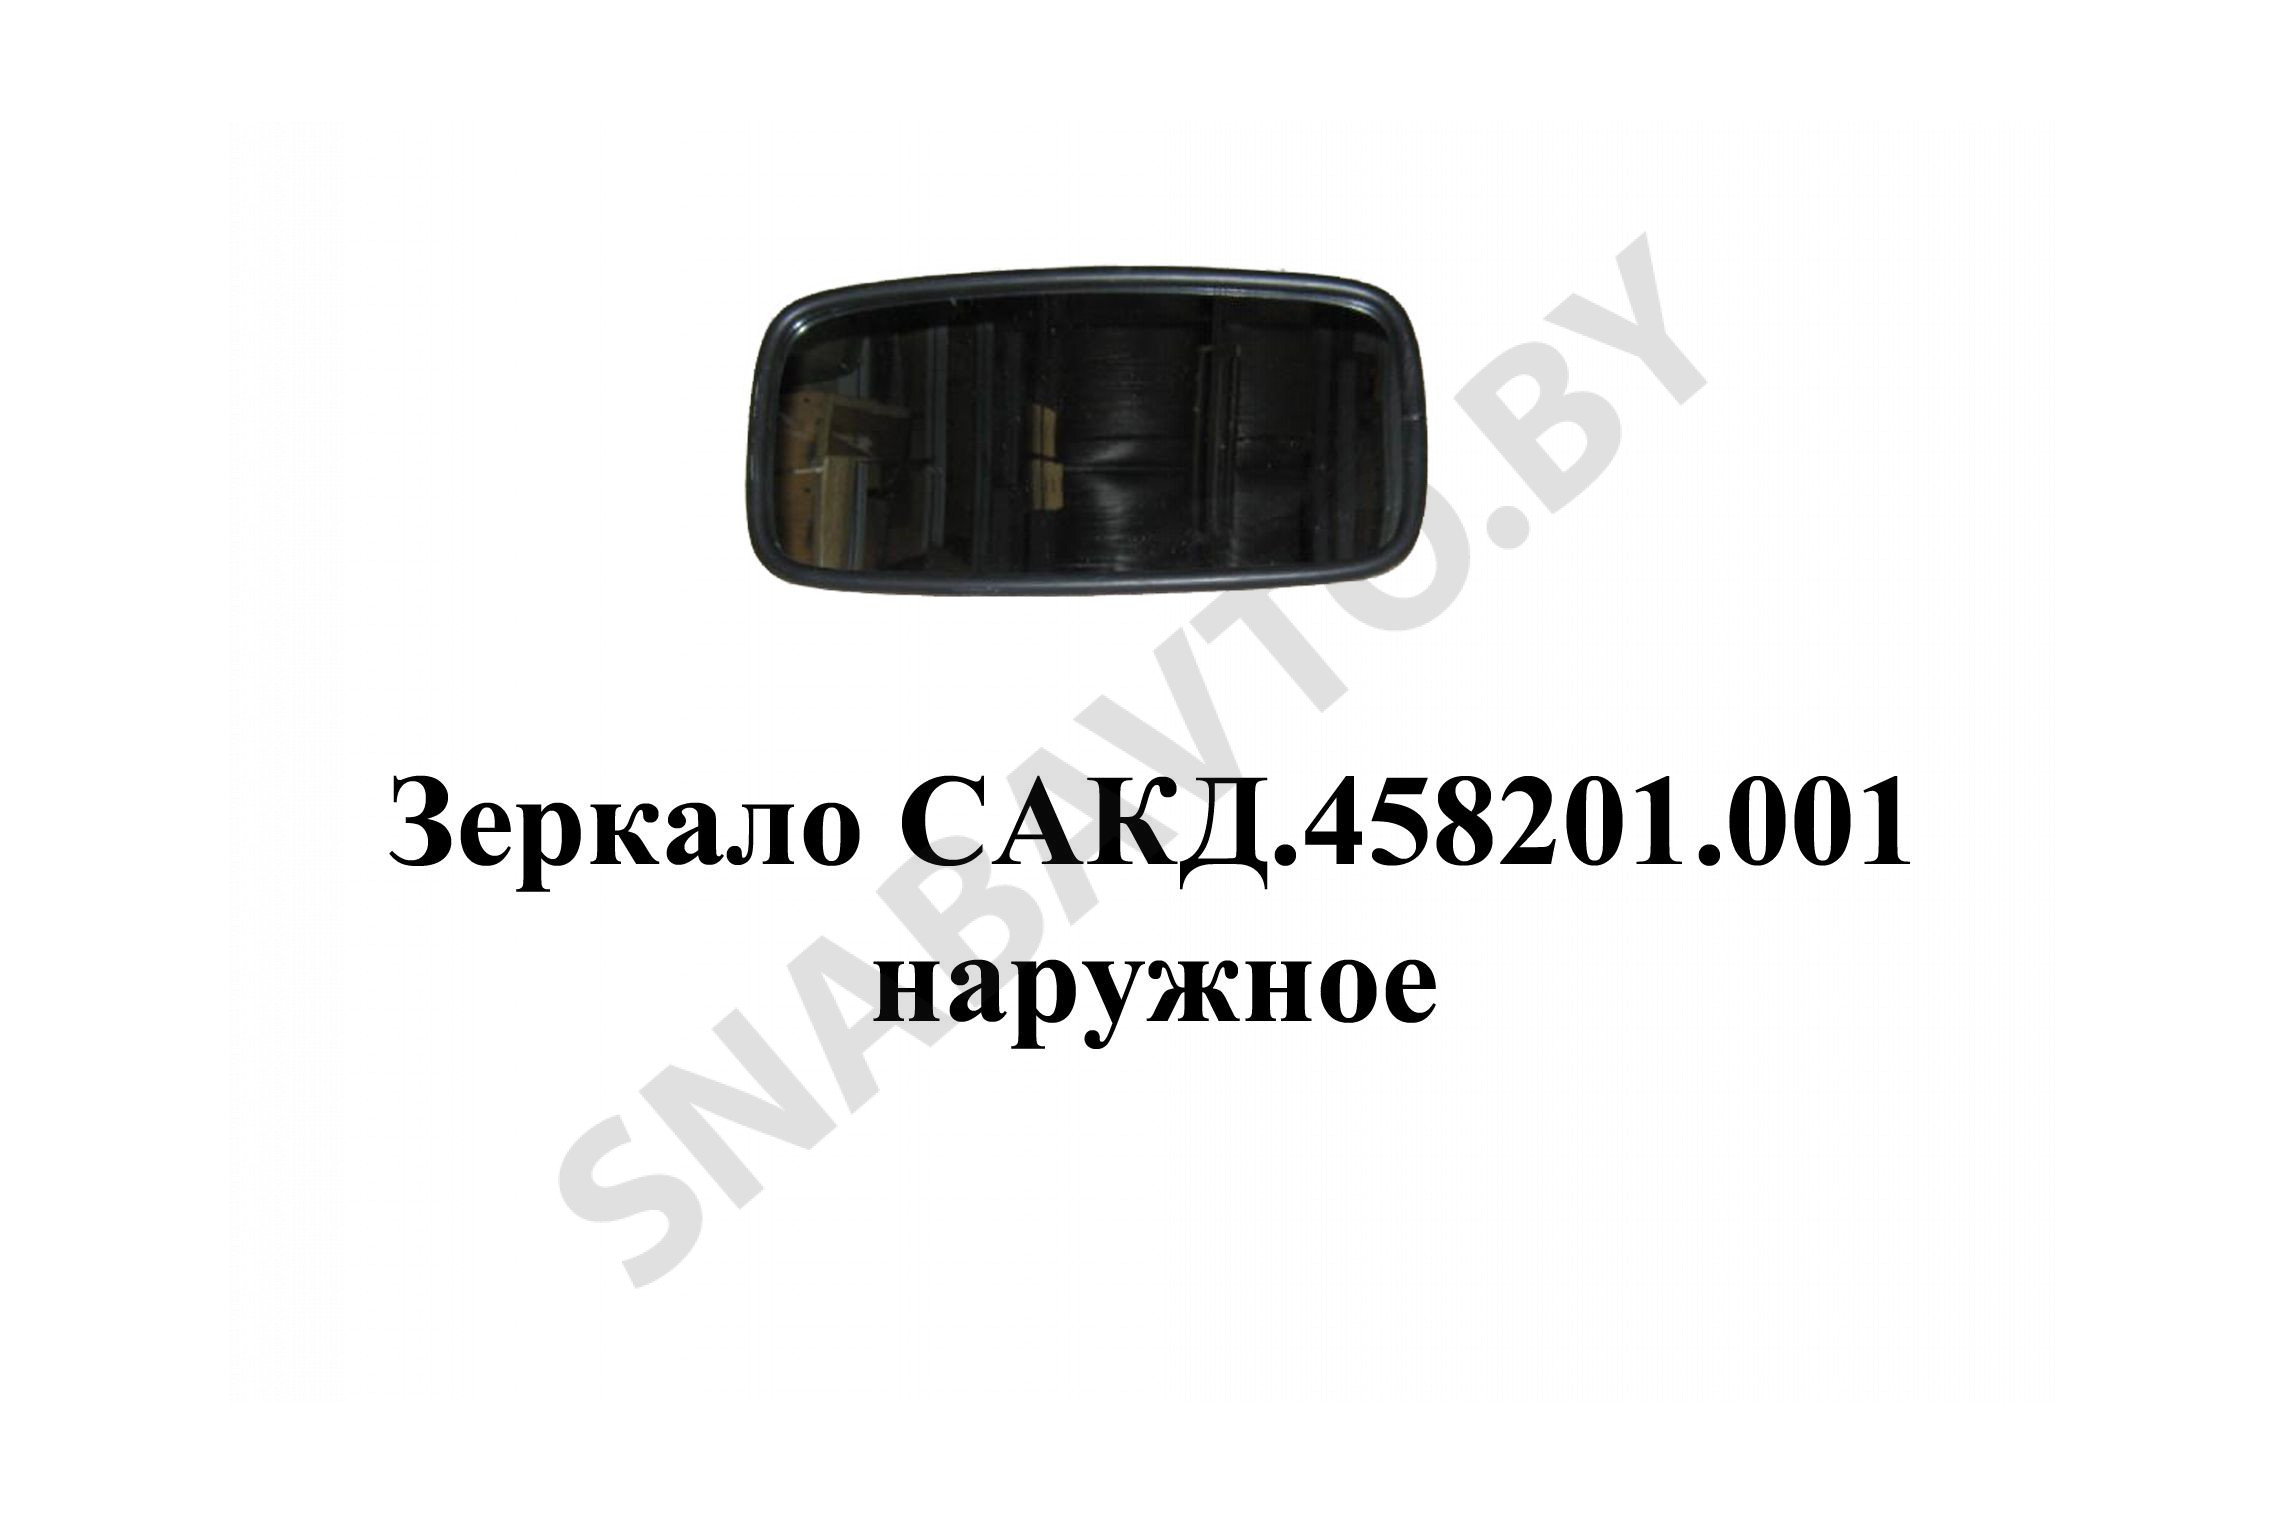 САКД.458201.001